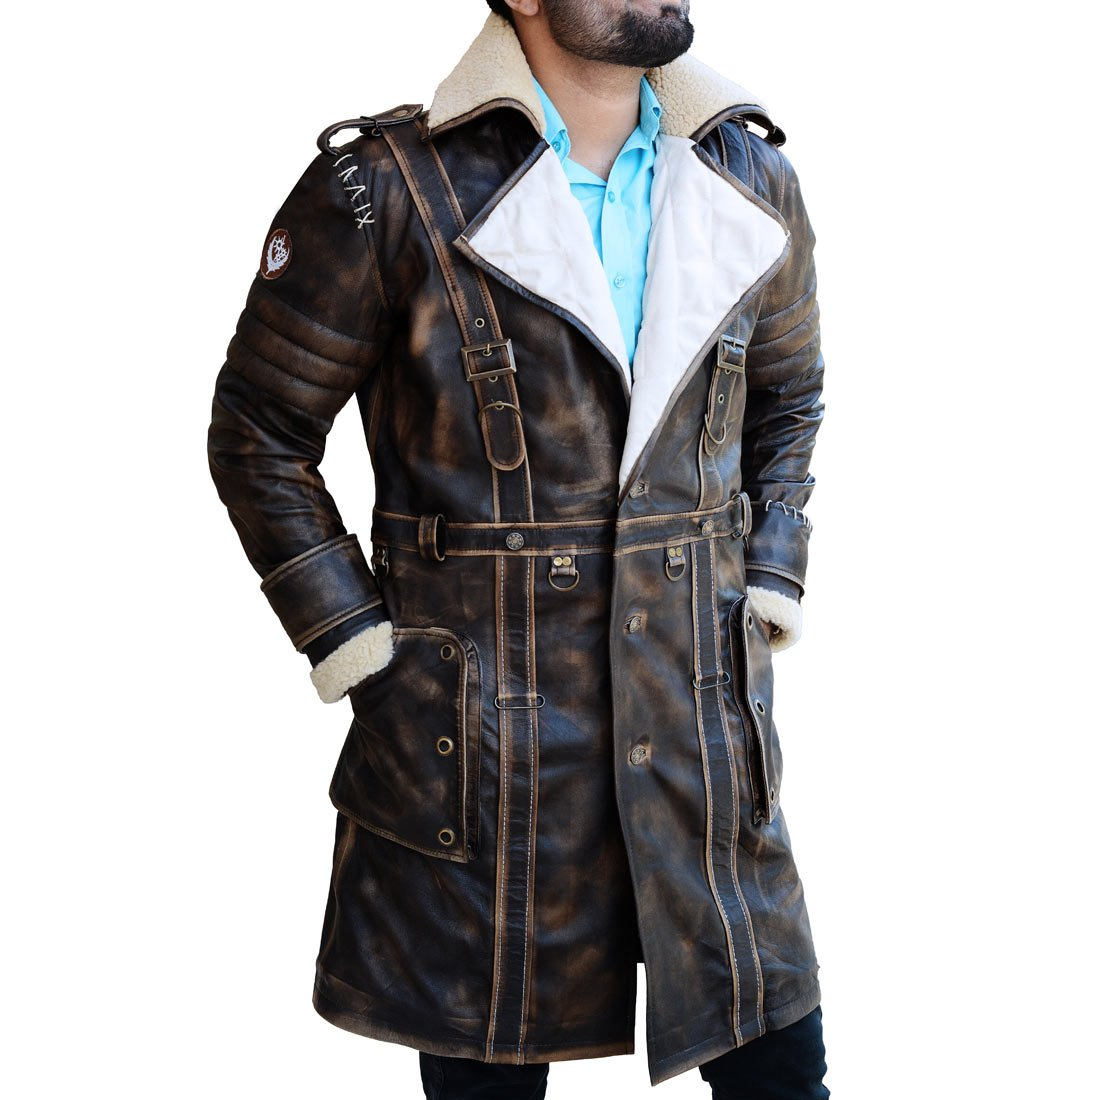 Elder Battle Brown Fur Collar Maxson Fall Long Trench Coat Out 4 Jacket The Custom Jacket